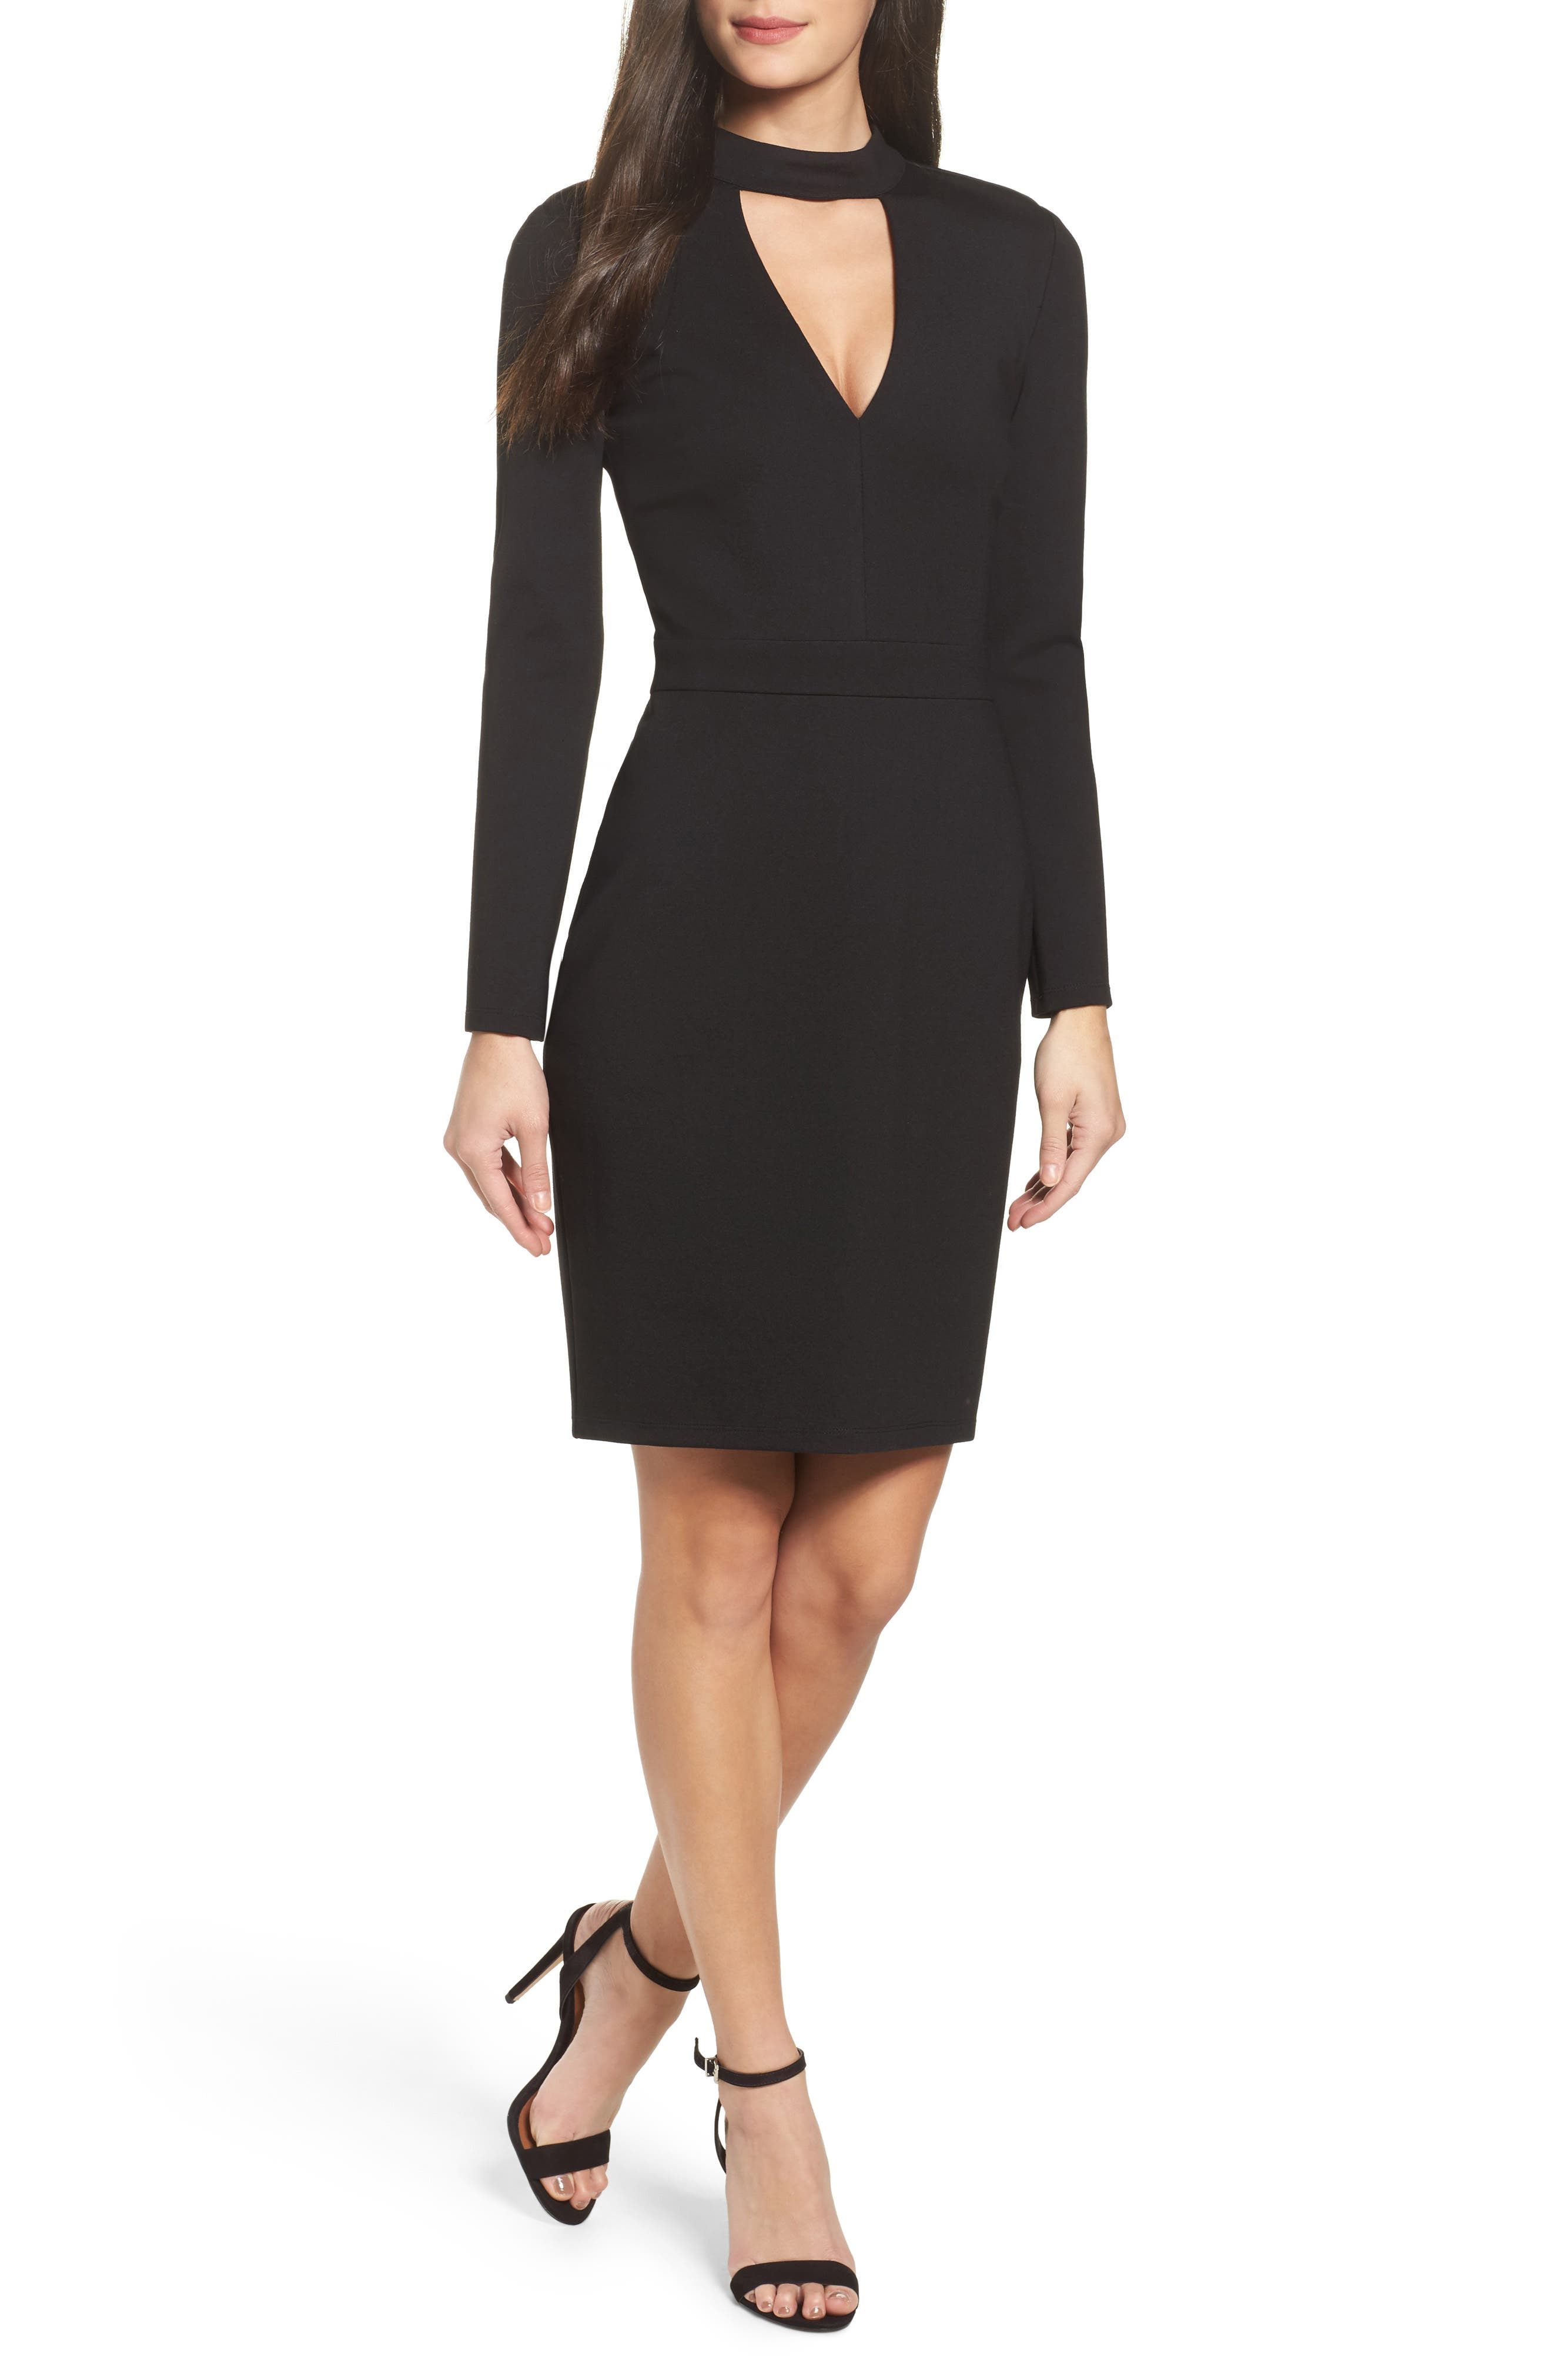 Adelyn Rae Laila Choker Body-Con Dress